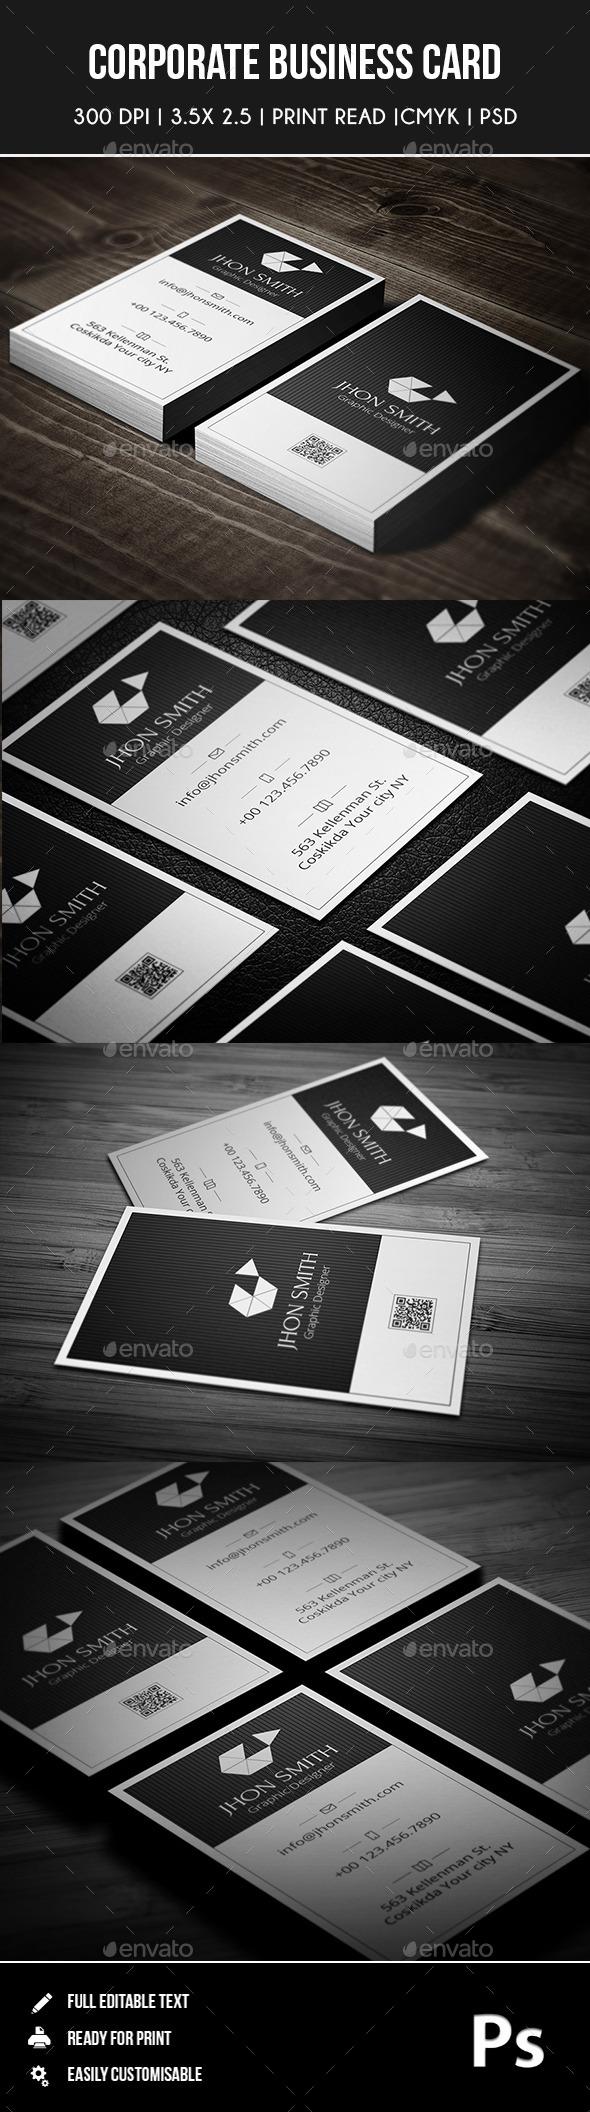 Corporate Business Card 02 - Corporate Business Cards